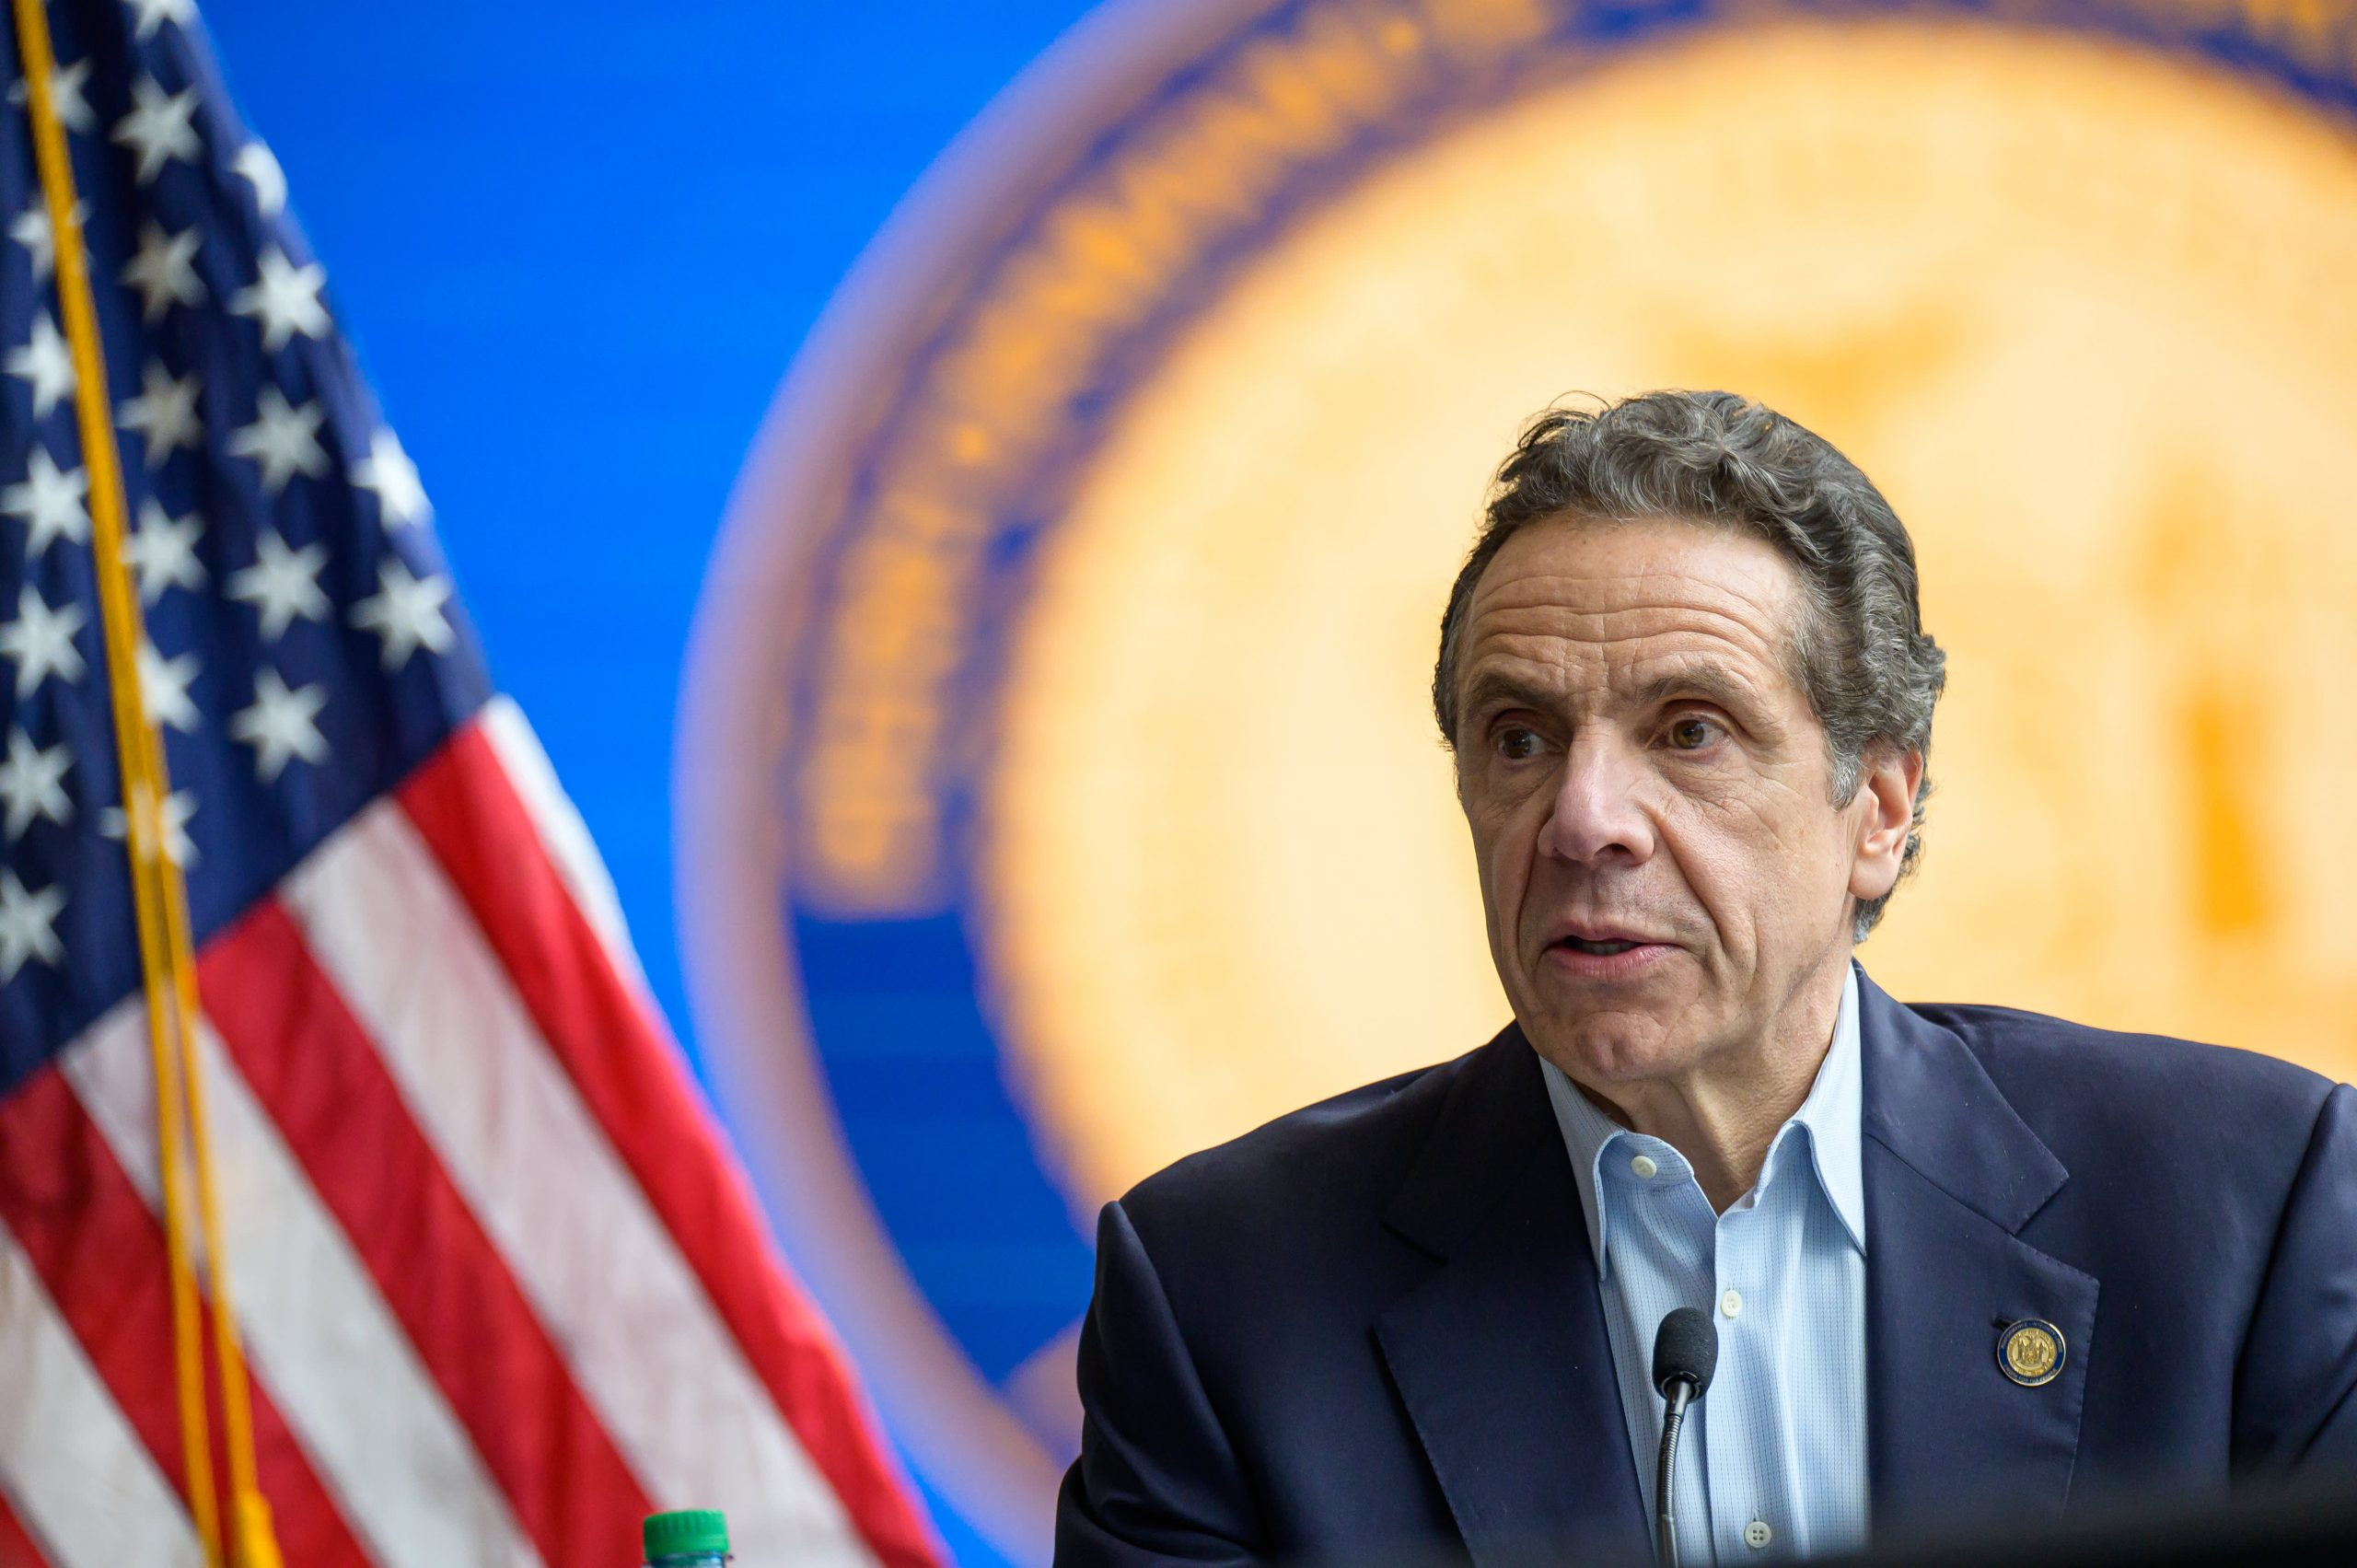 New York Metropolis will shut indoor eating beginning Monday, Gov. Cuomo says